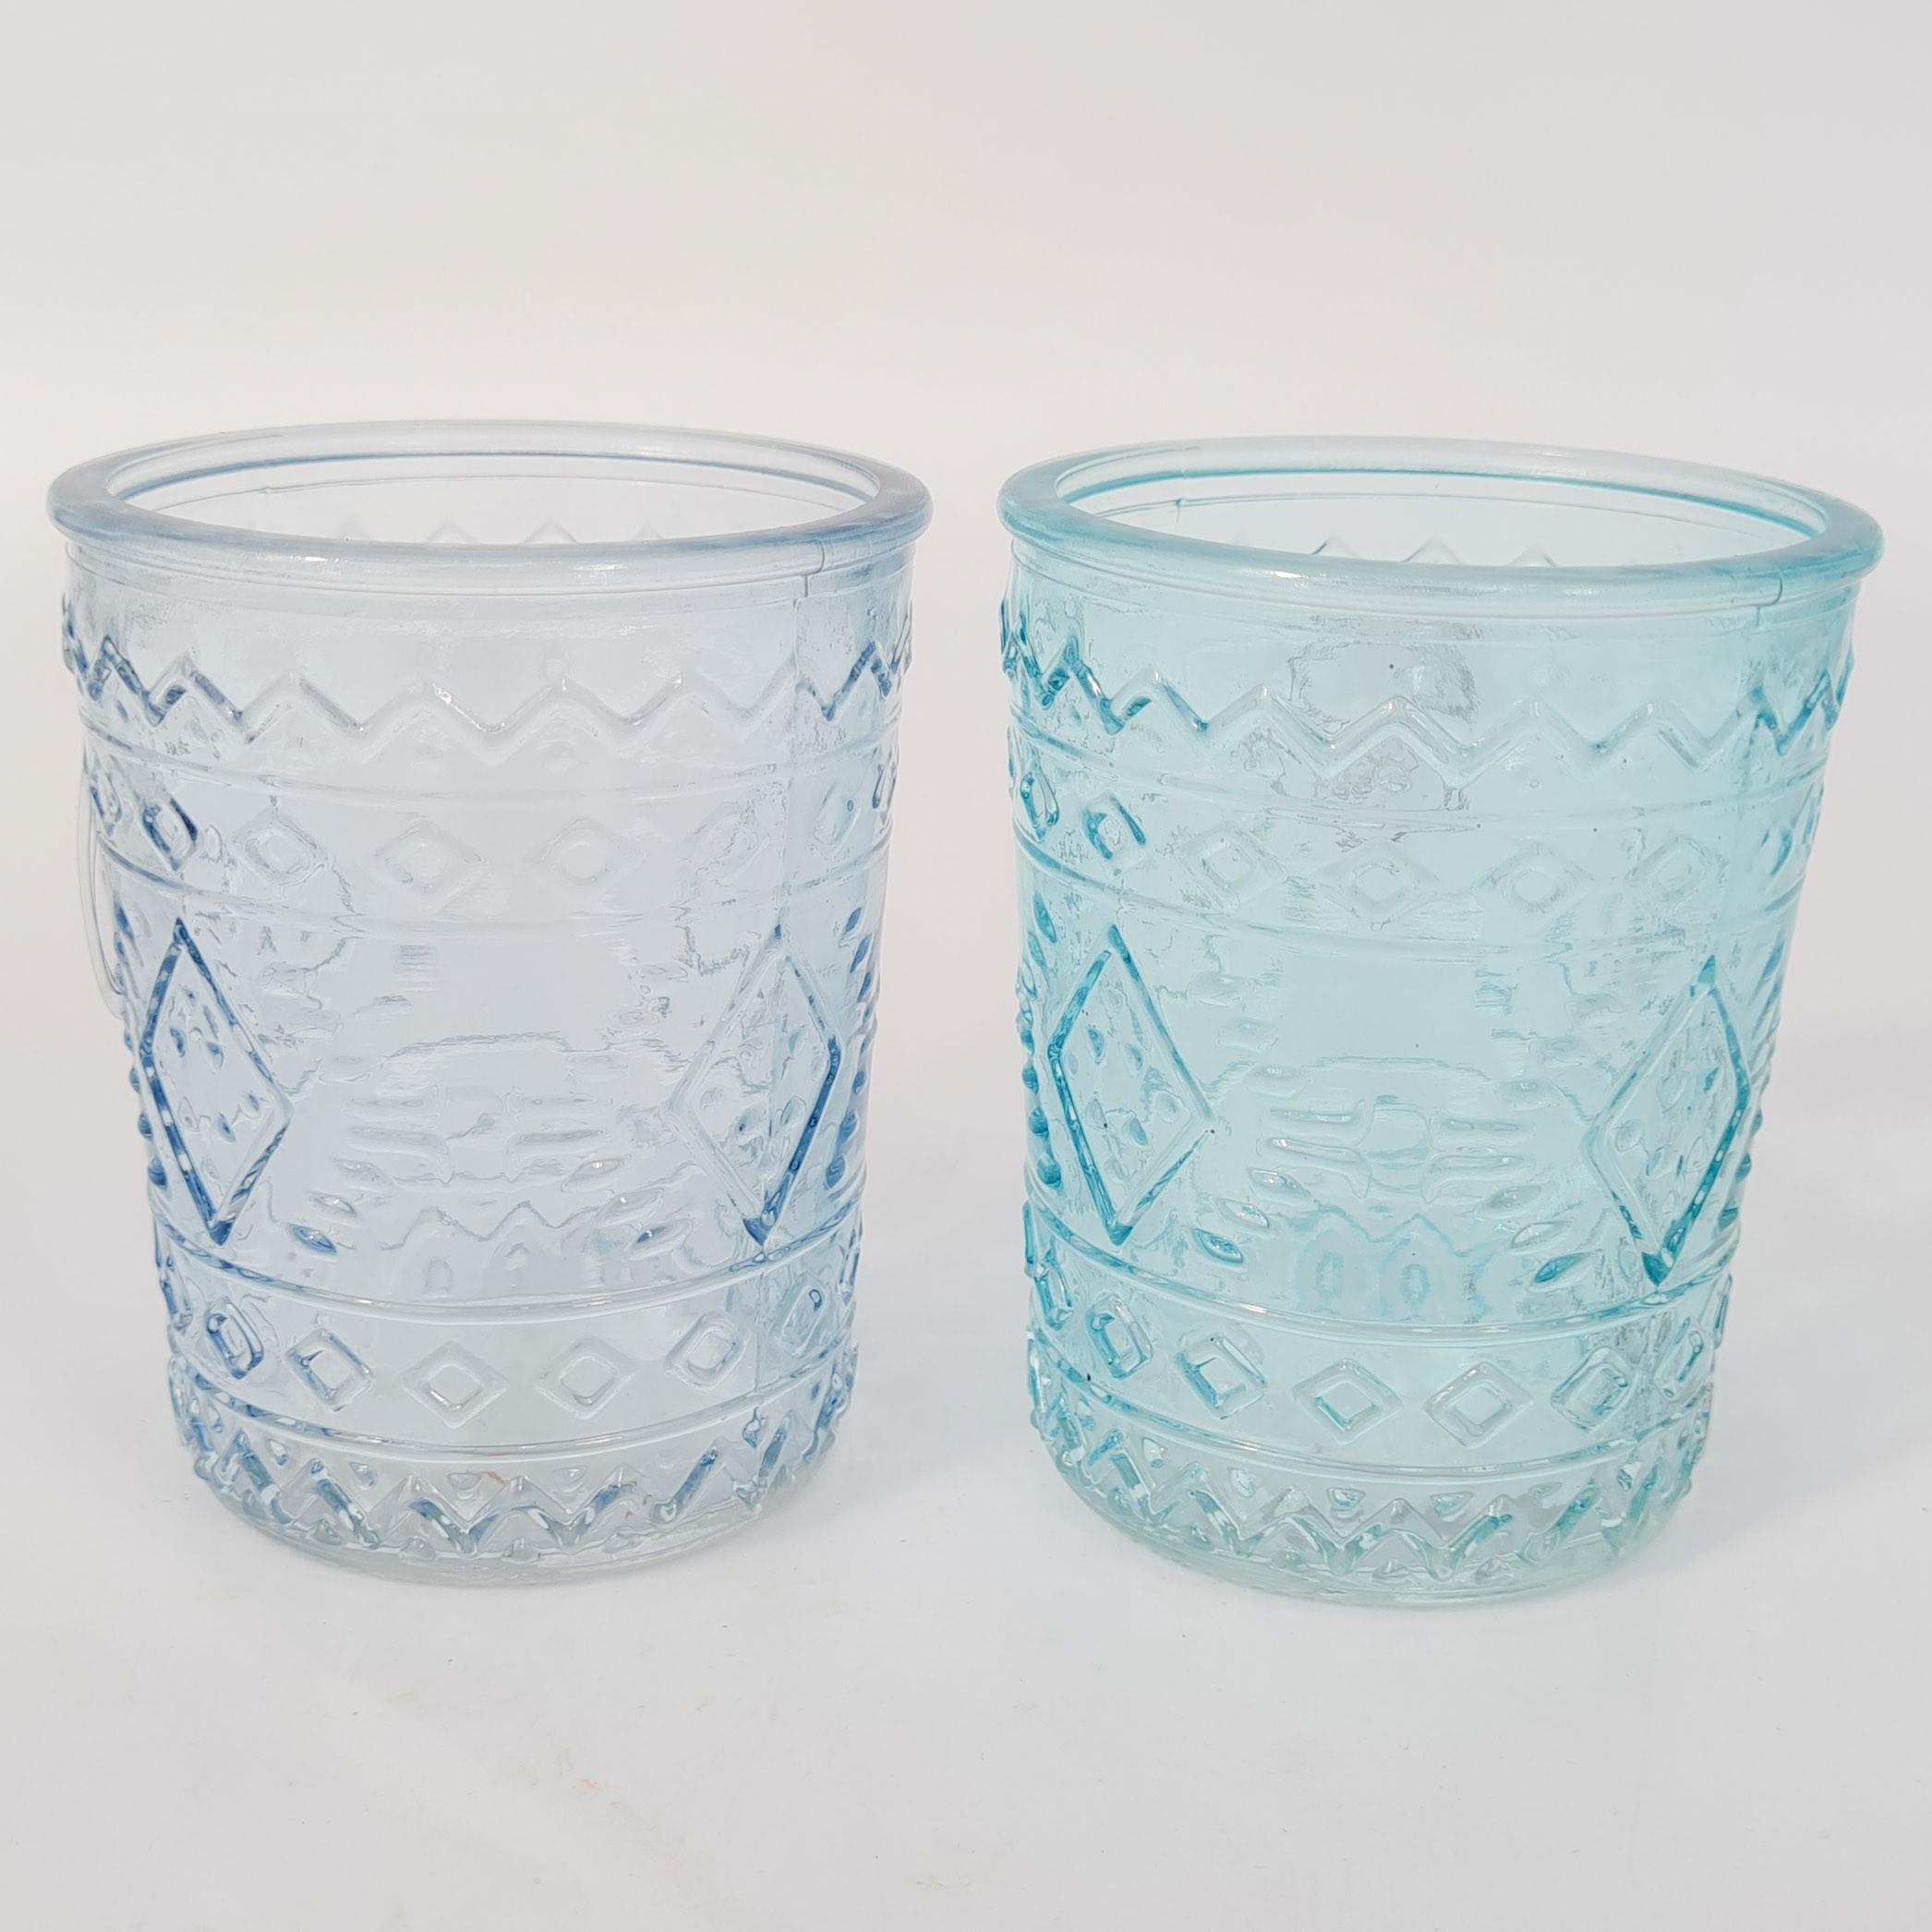 "Trinkglas 6er Set ""Mare"" Bild 2"